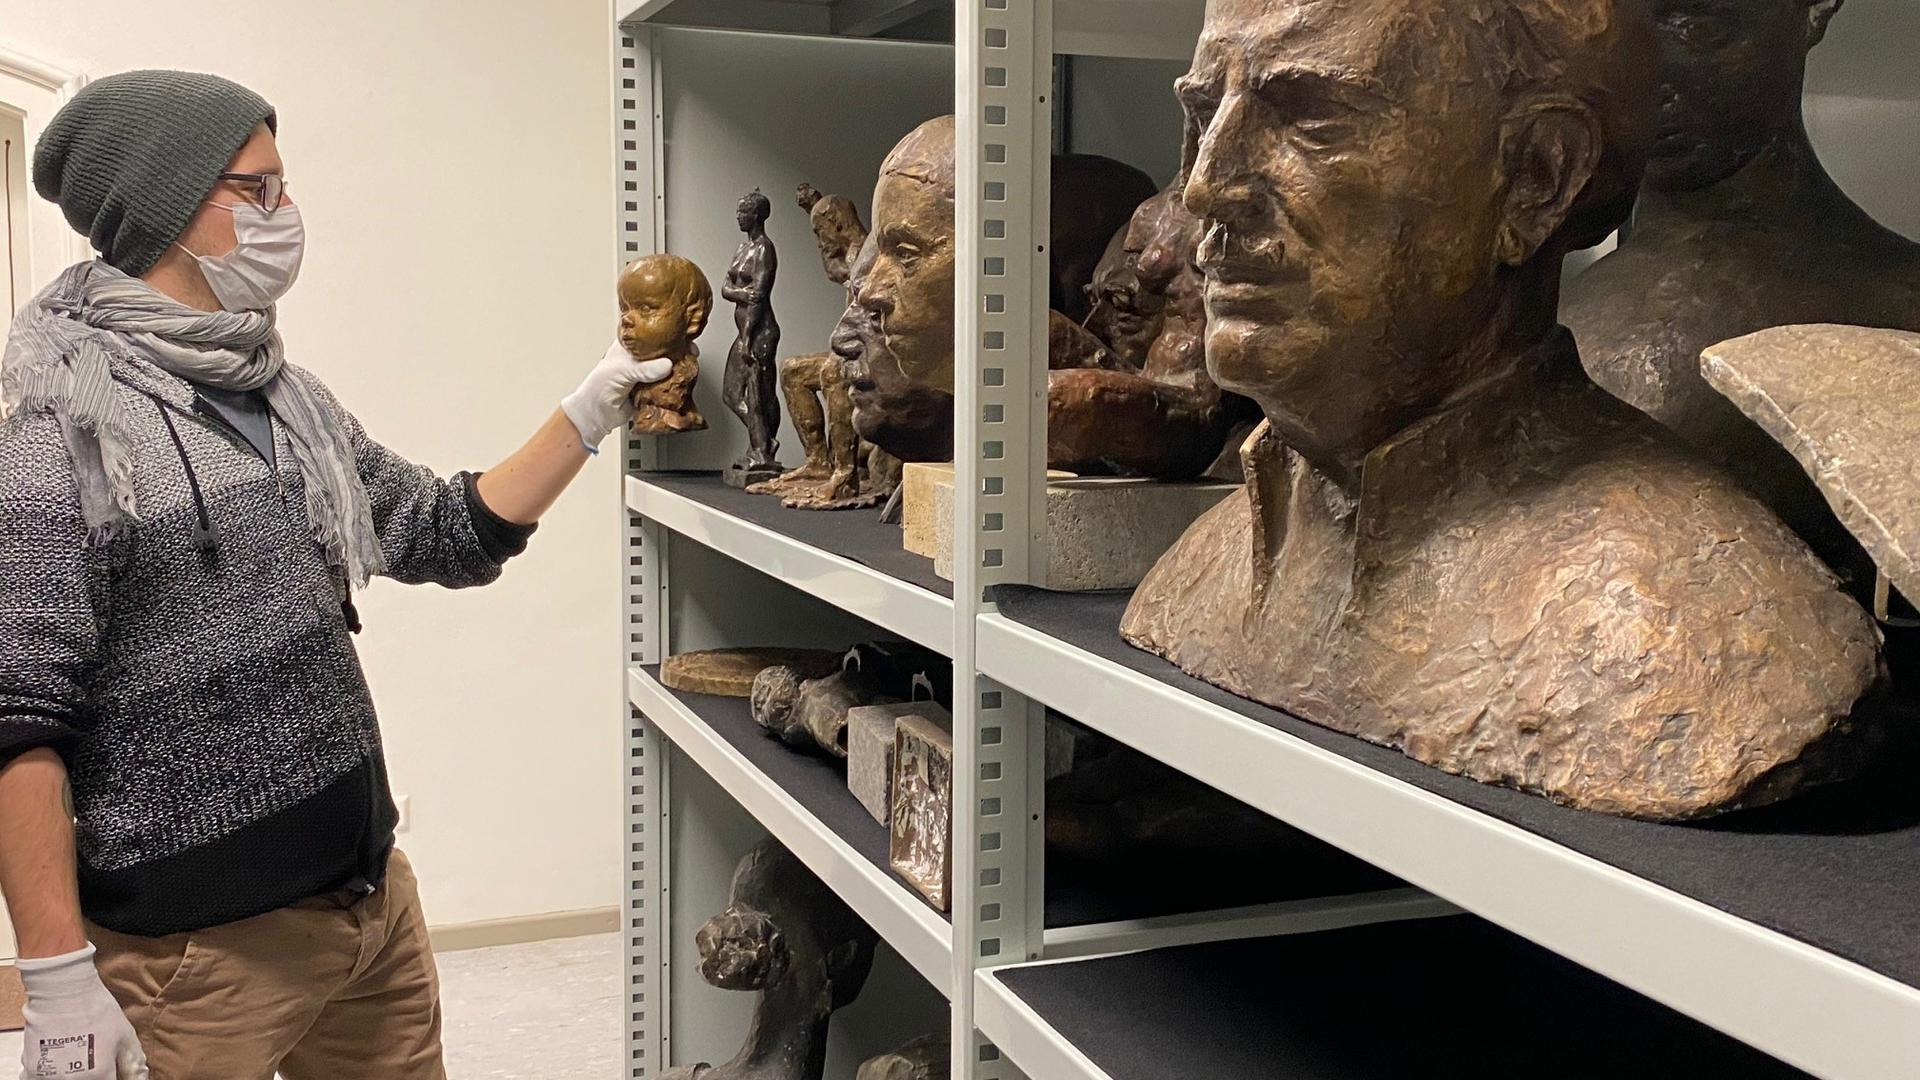 Man udn Skulpturen im Regal